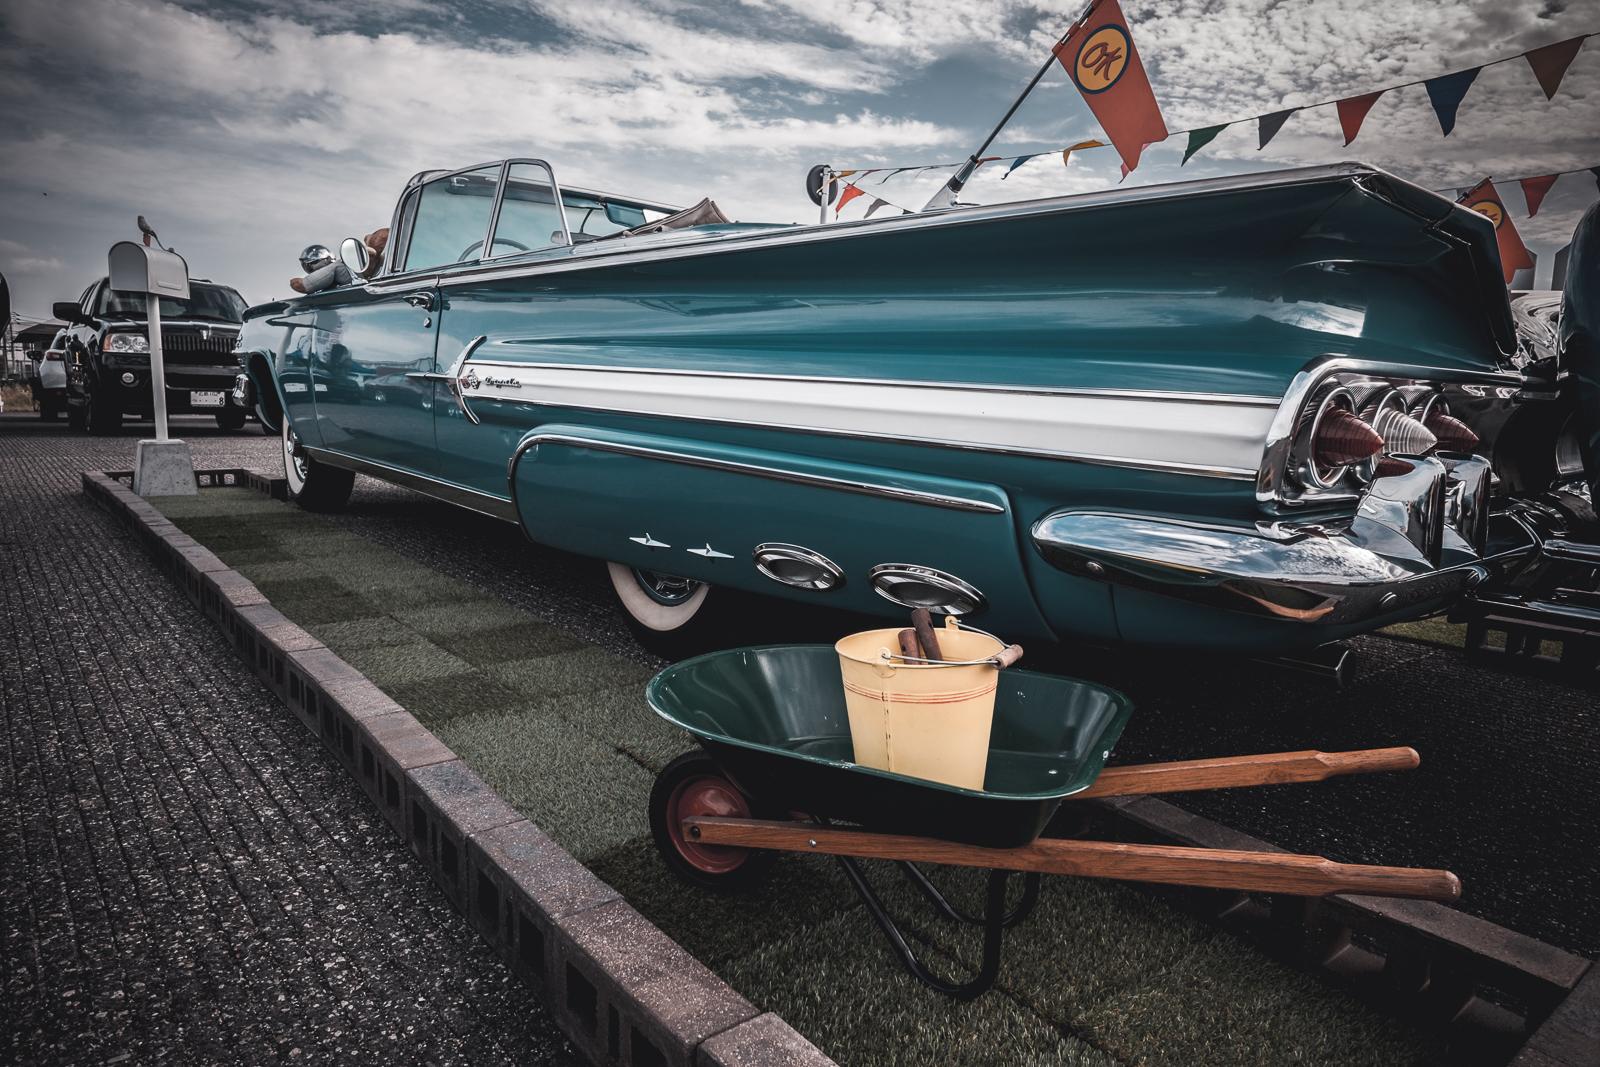 1960 Chevrolet Impala side.